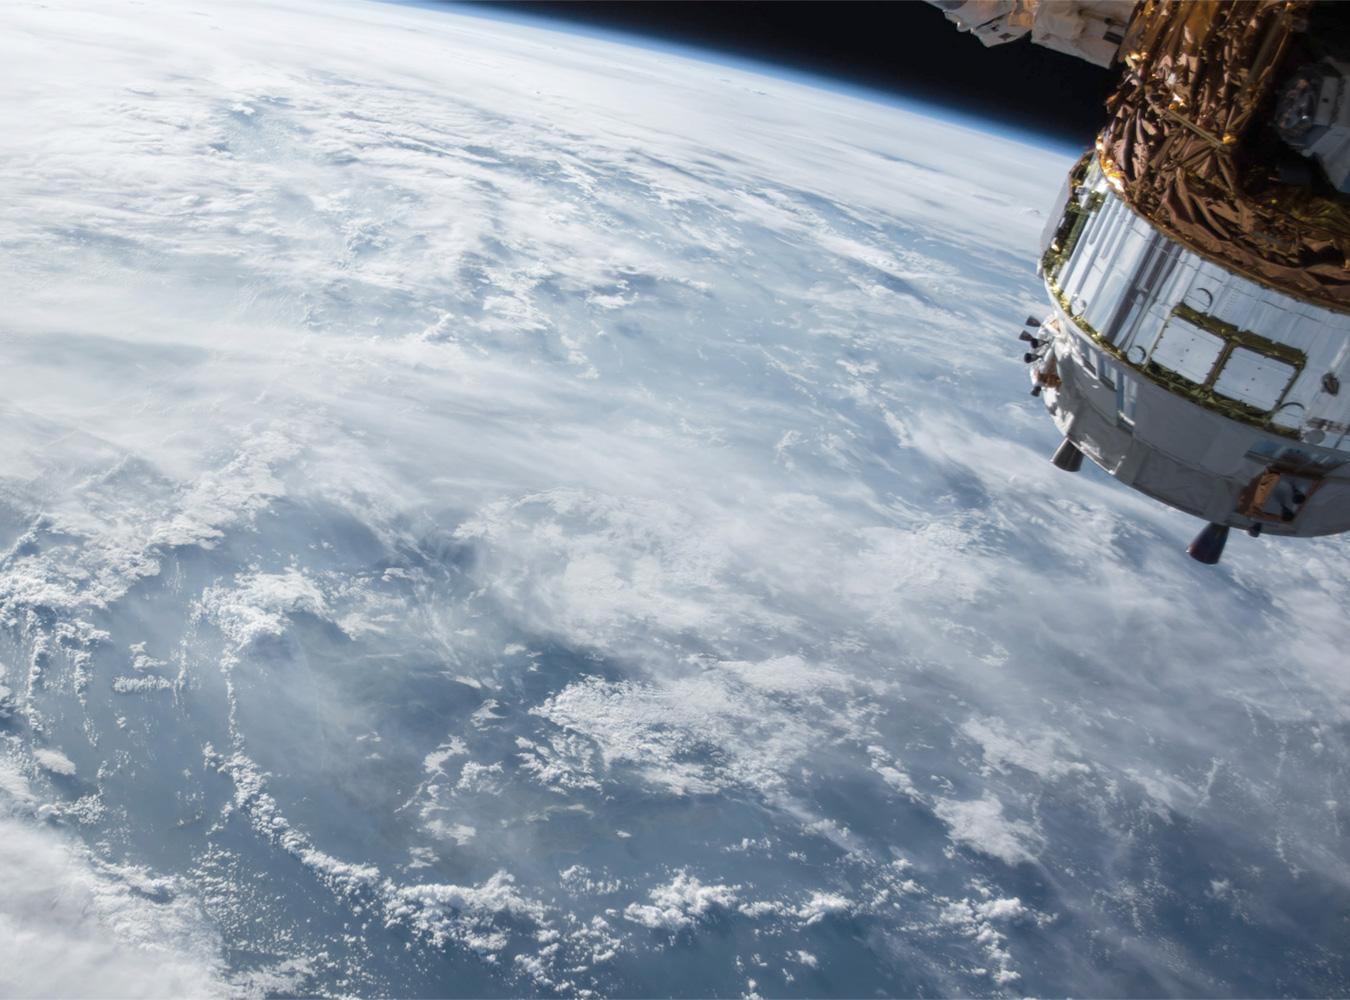 Logistics 4 Pharma - Company - Network - Preview, Image: ©2017 NASA